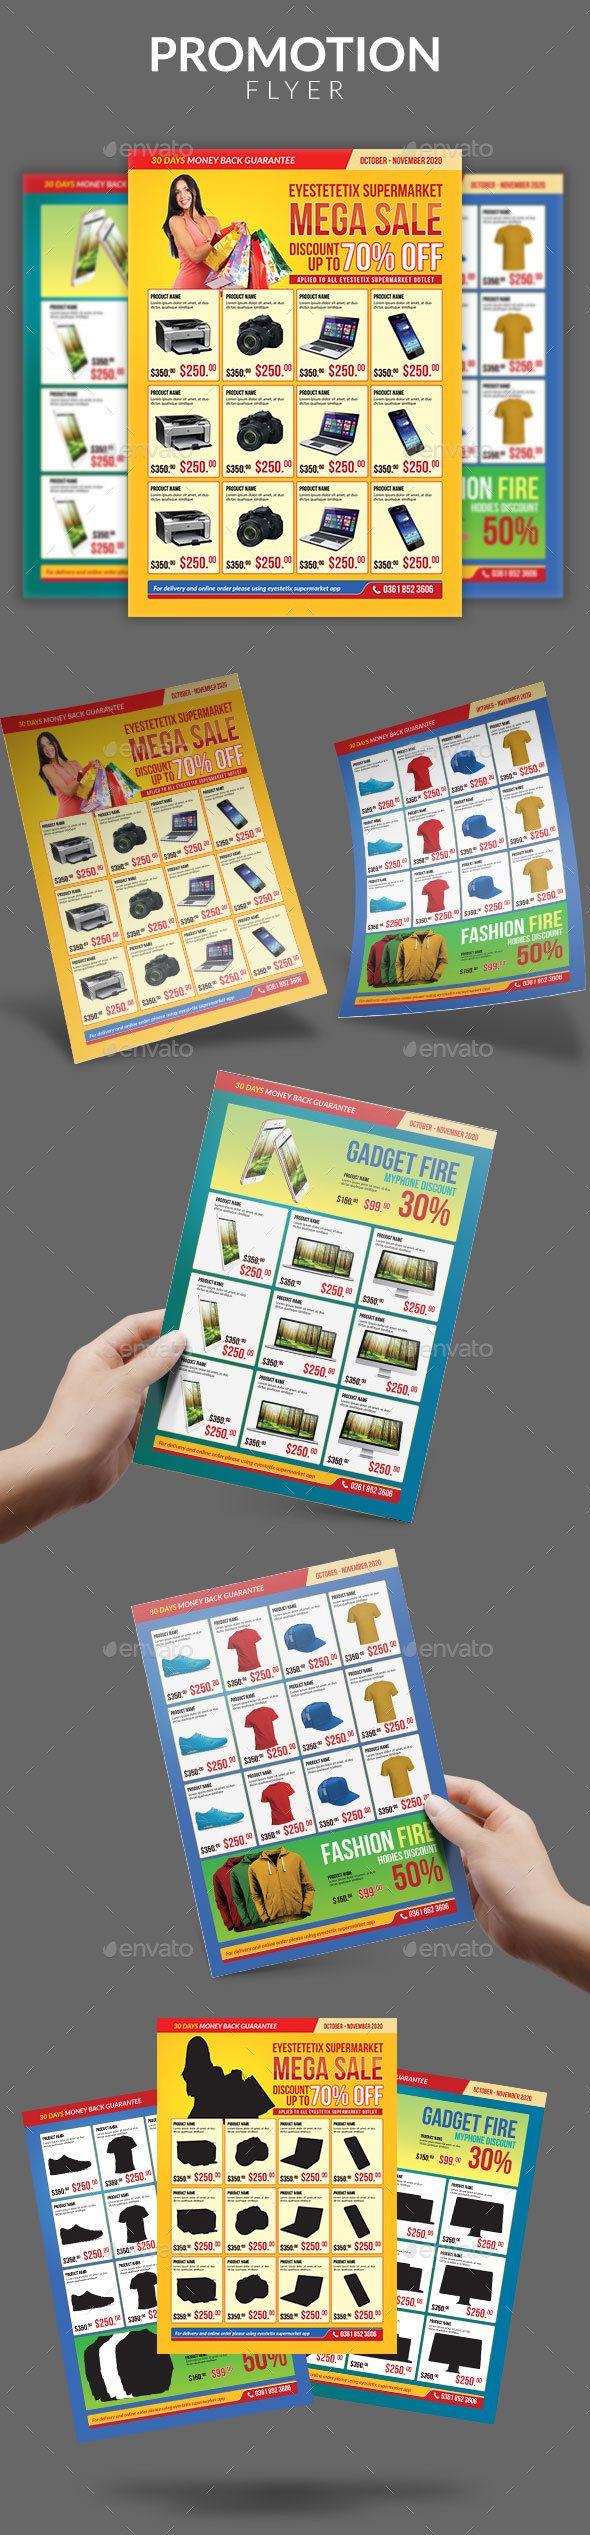 Multipurpose Promotion Sale Flyer Template - Commerce Flyers